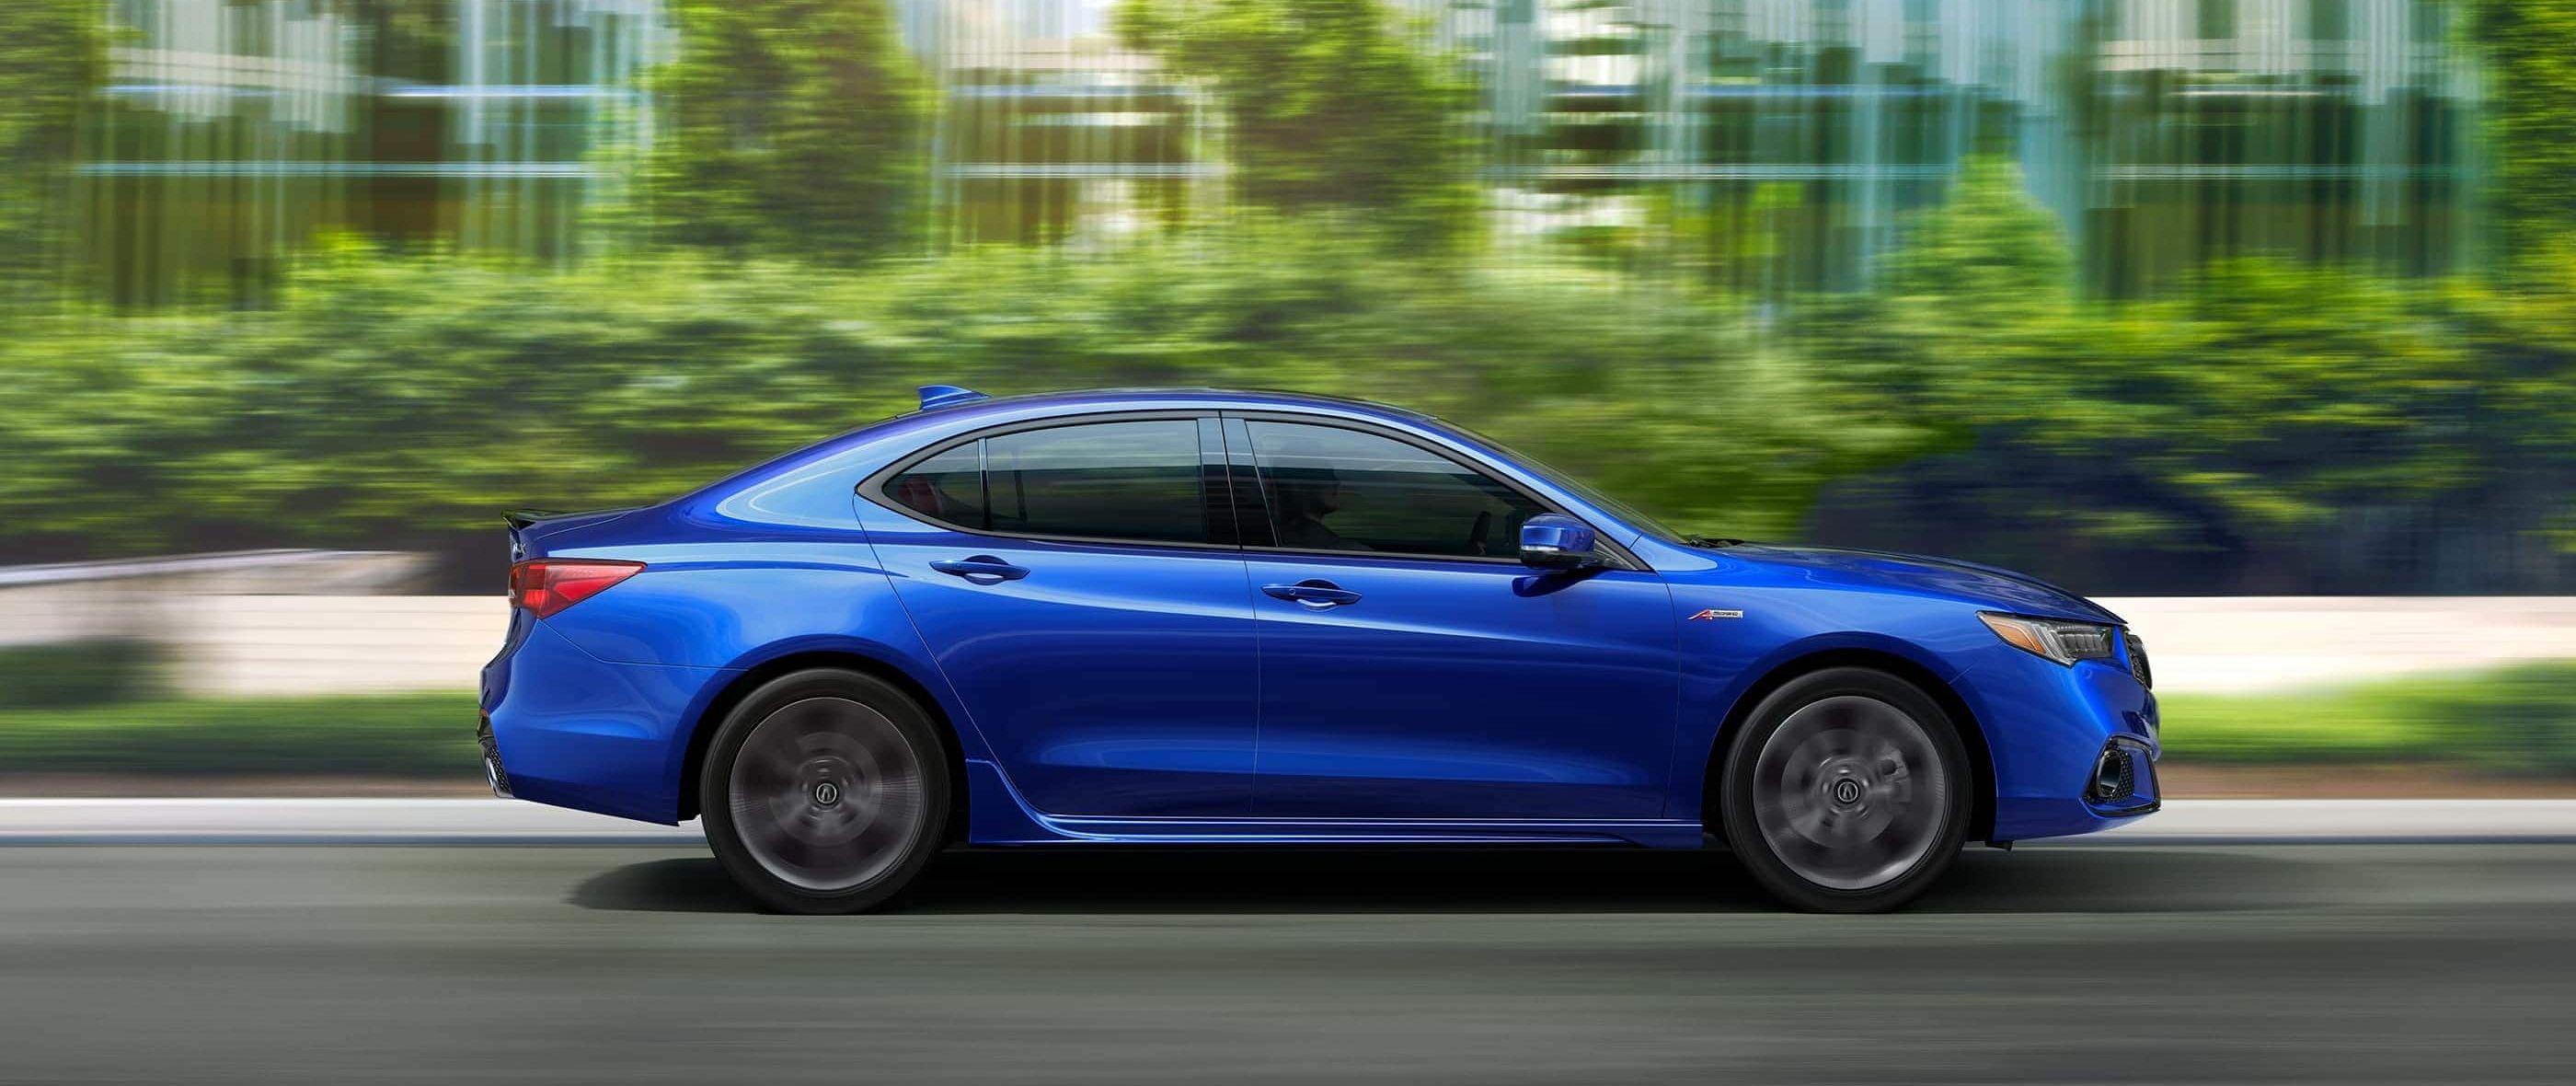 2020 Acura Tlx For Sale Near Farmington Mi